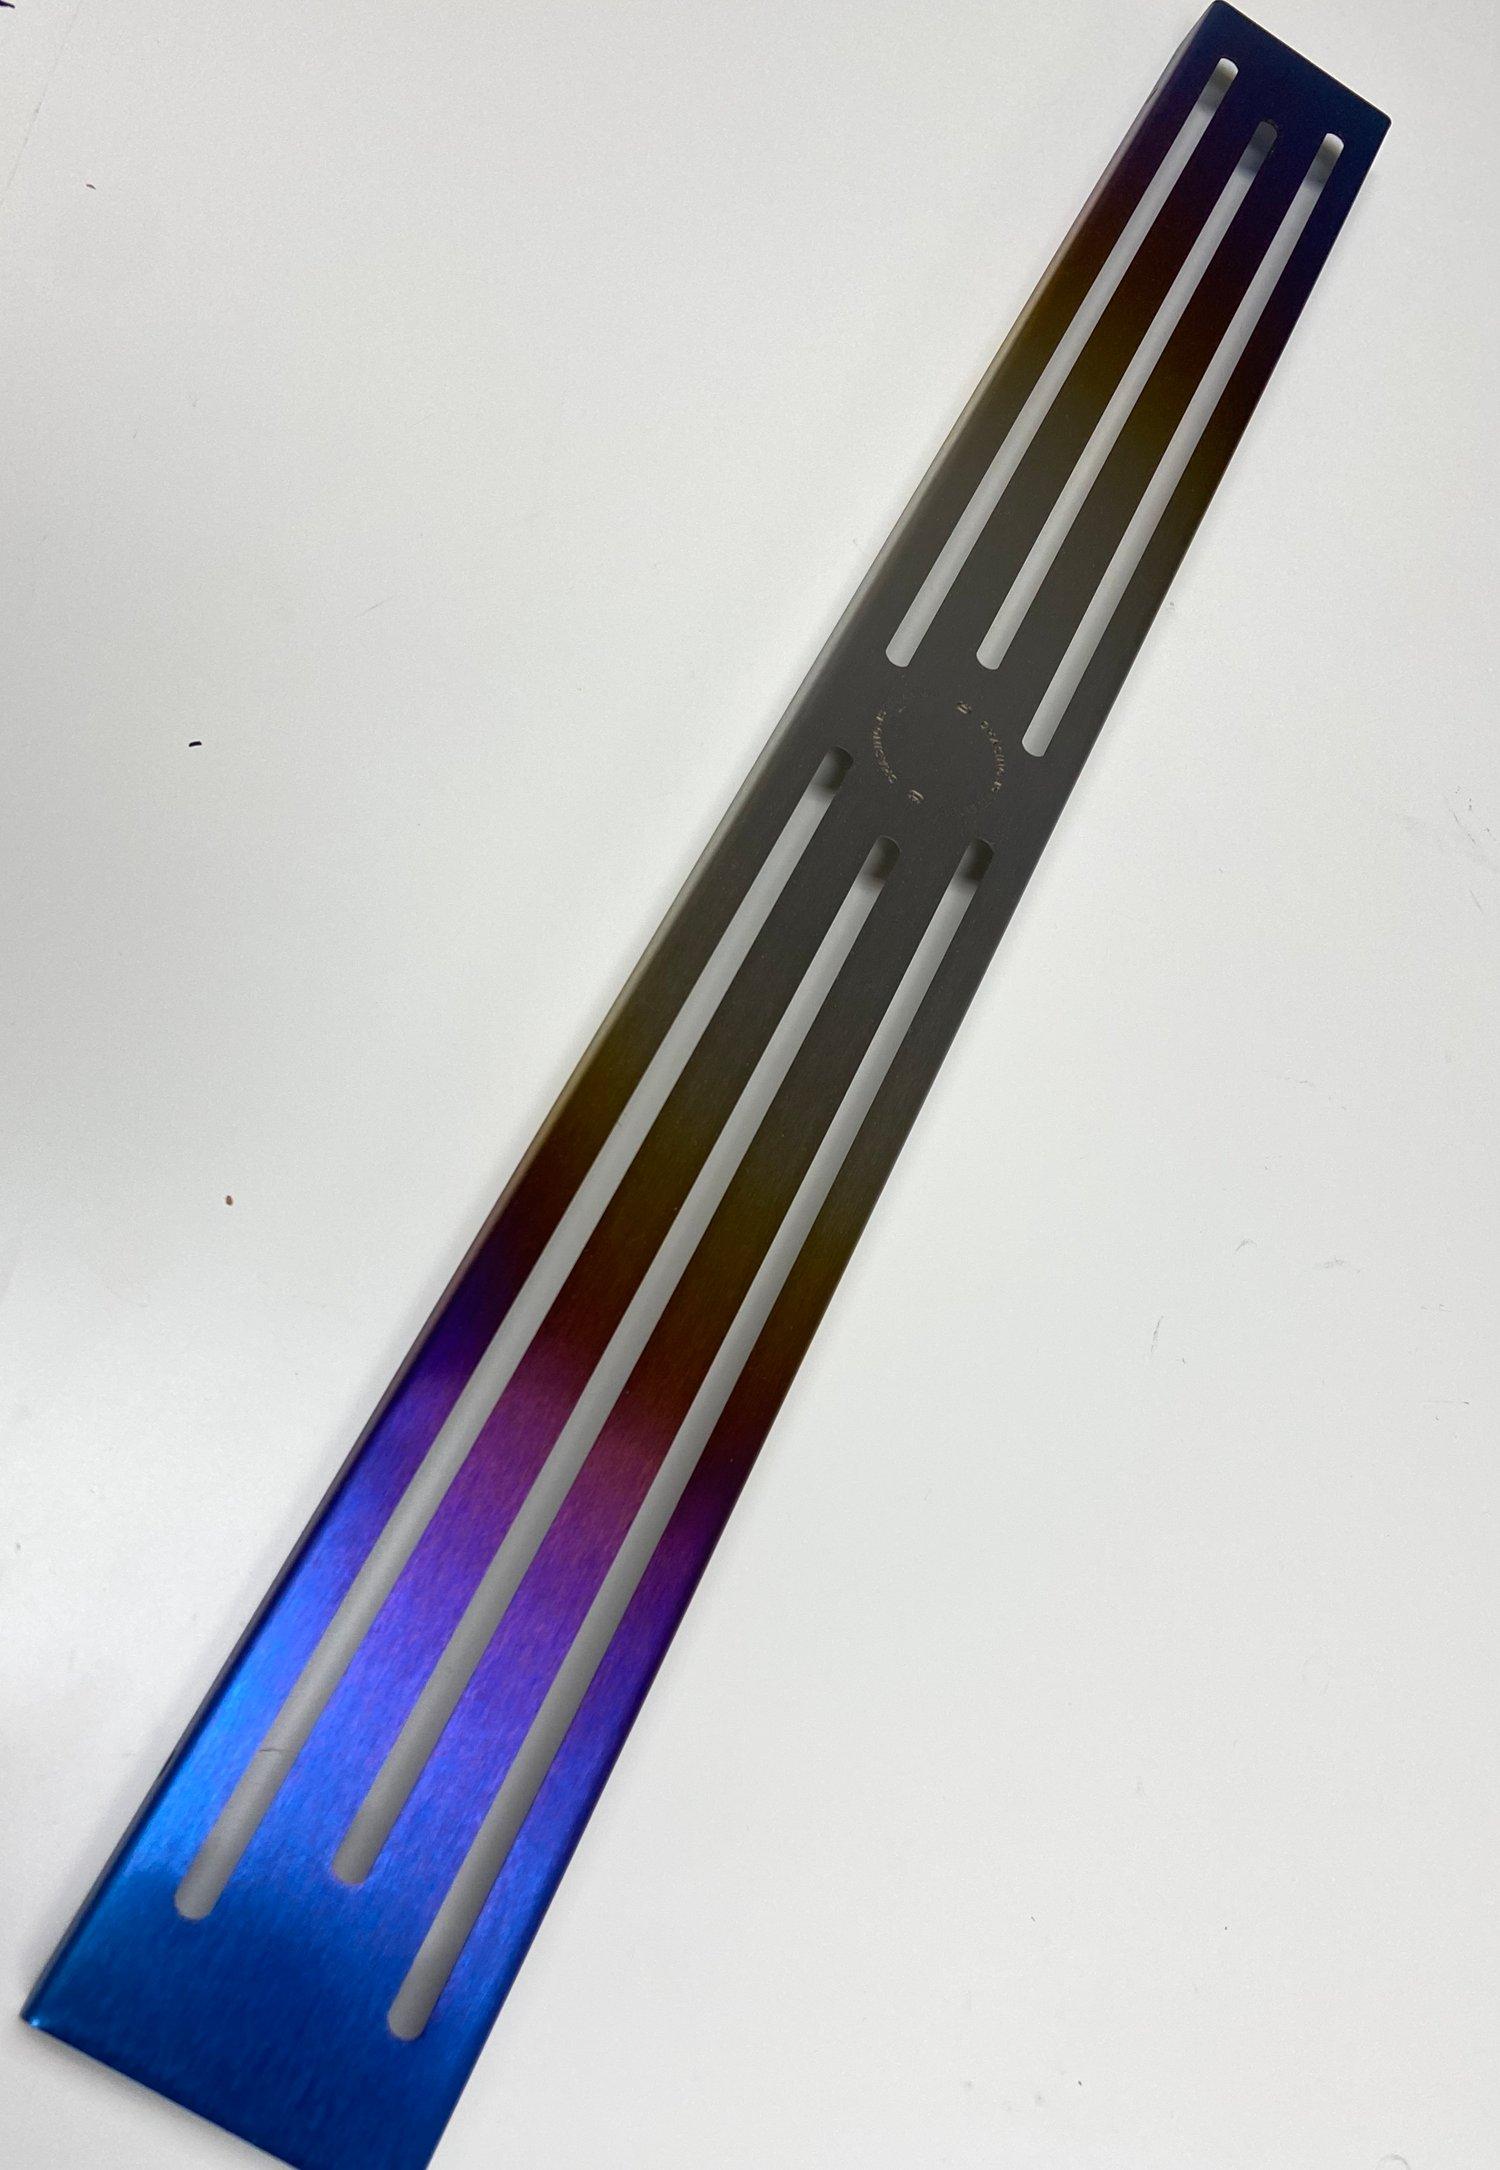 Image of S2000 Titanium Front Cross member cover.